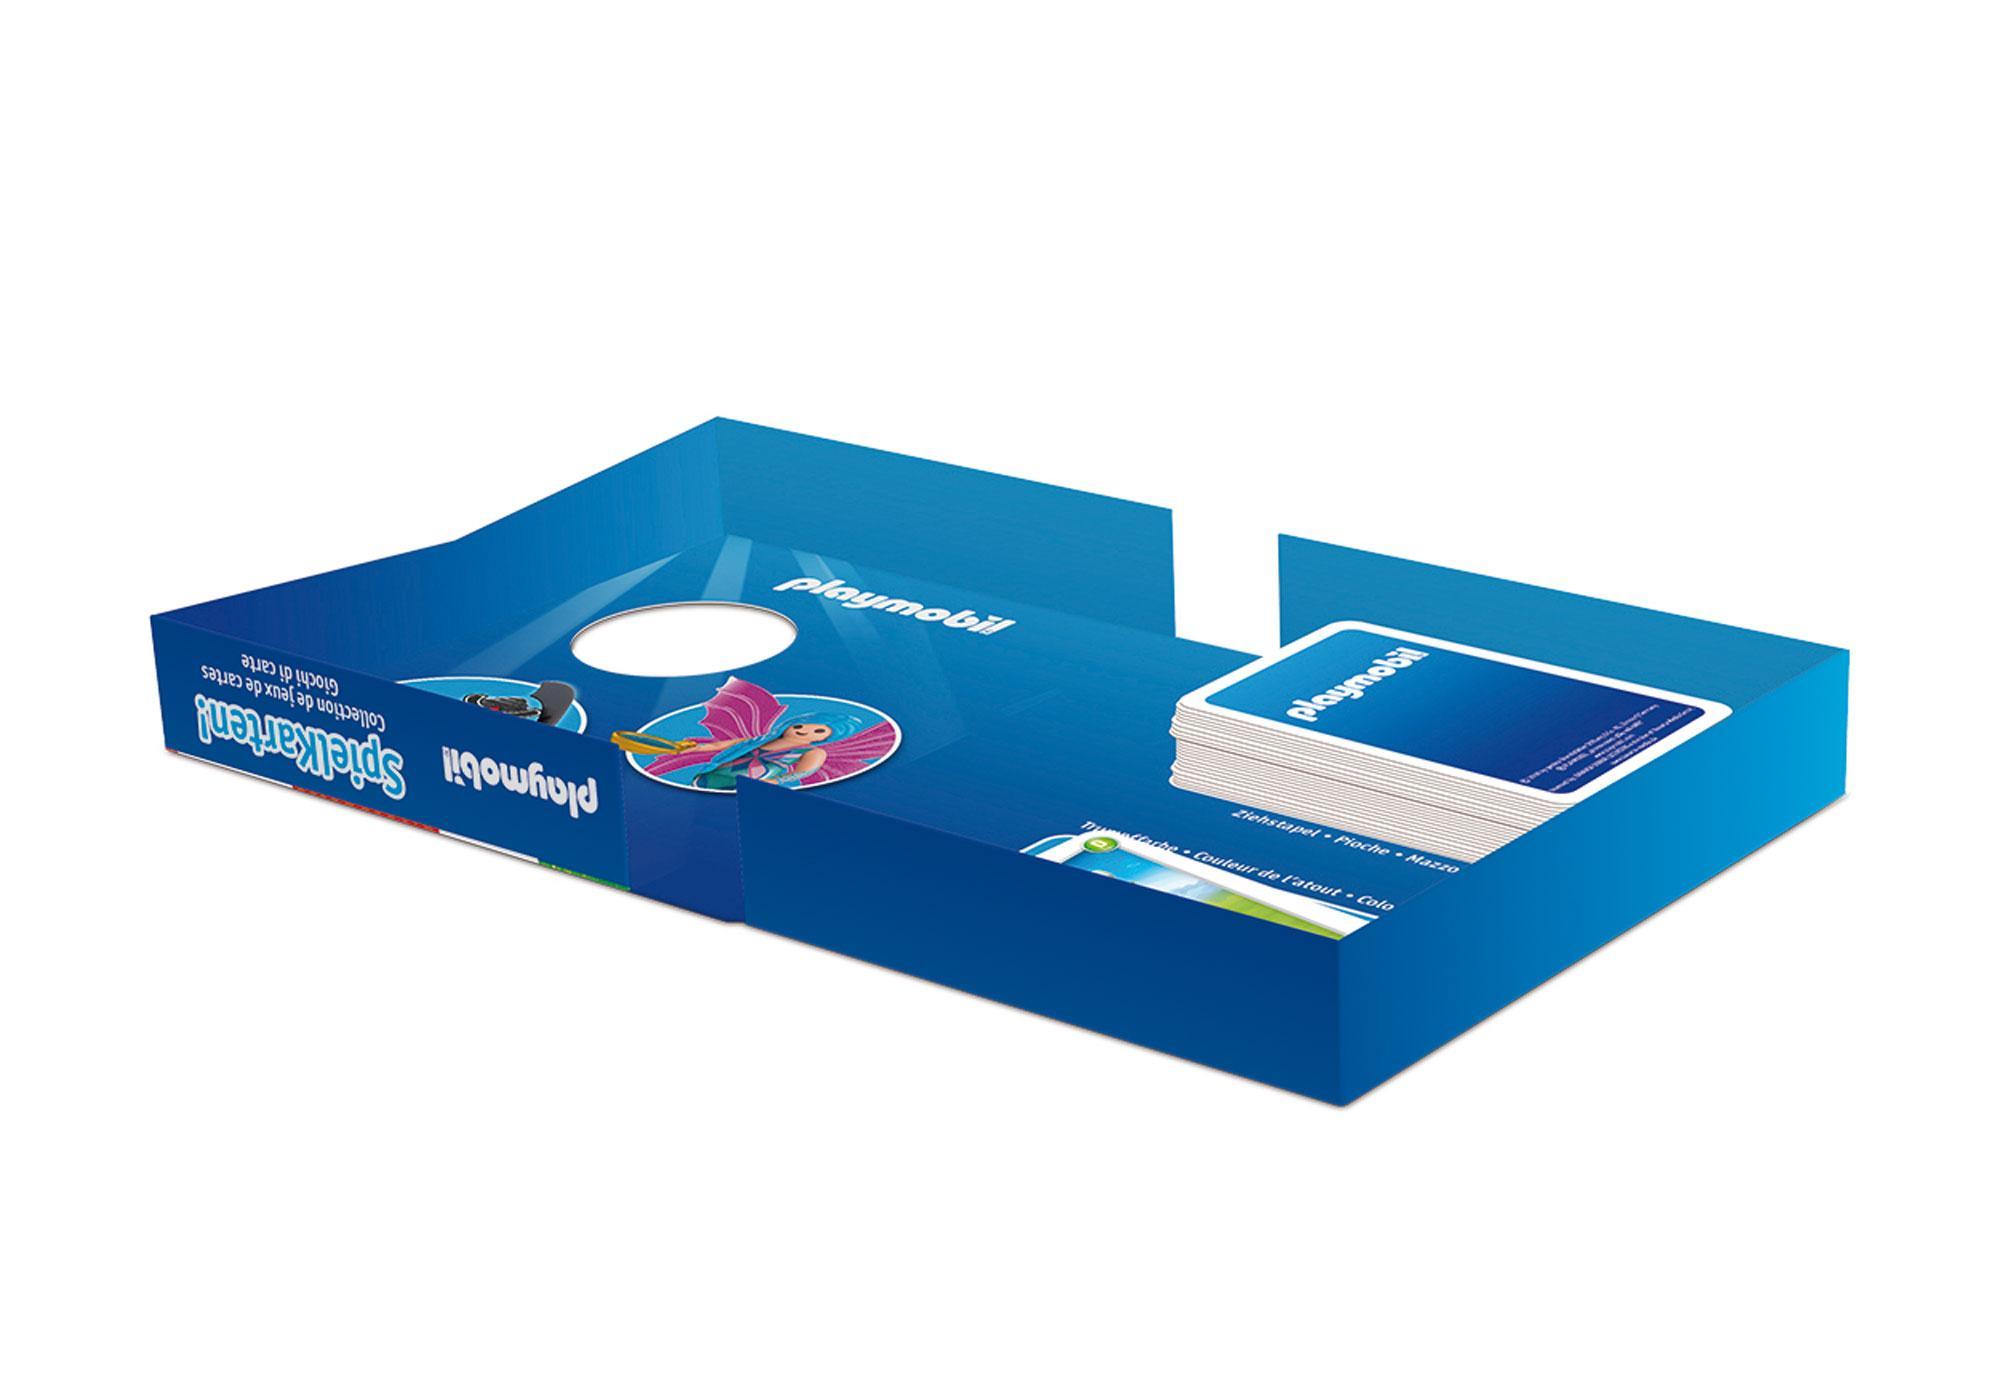 http://media.playmobil.com/i/playmobil/80096_product_extra2/SpielKarten! - Die Kartenspielesammlung